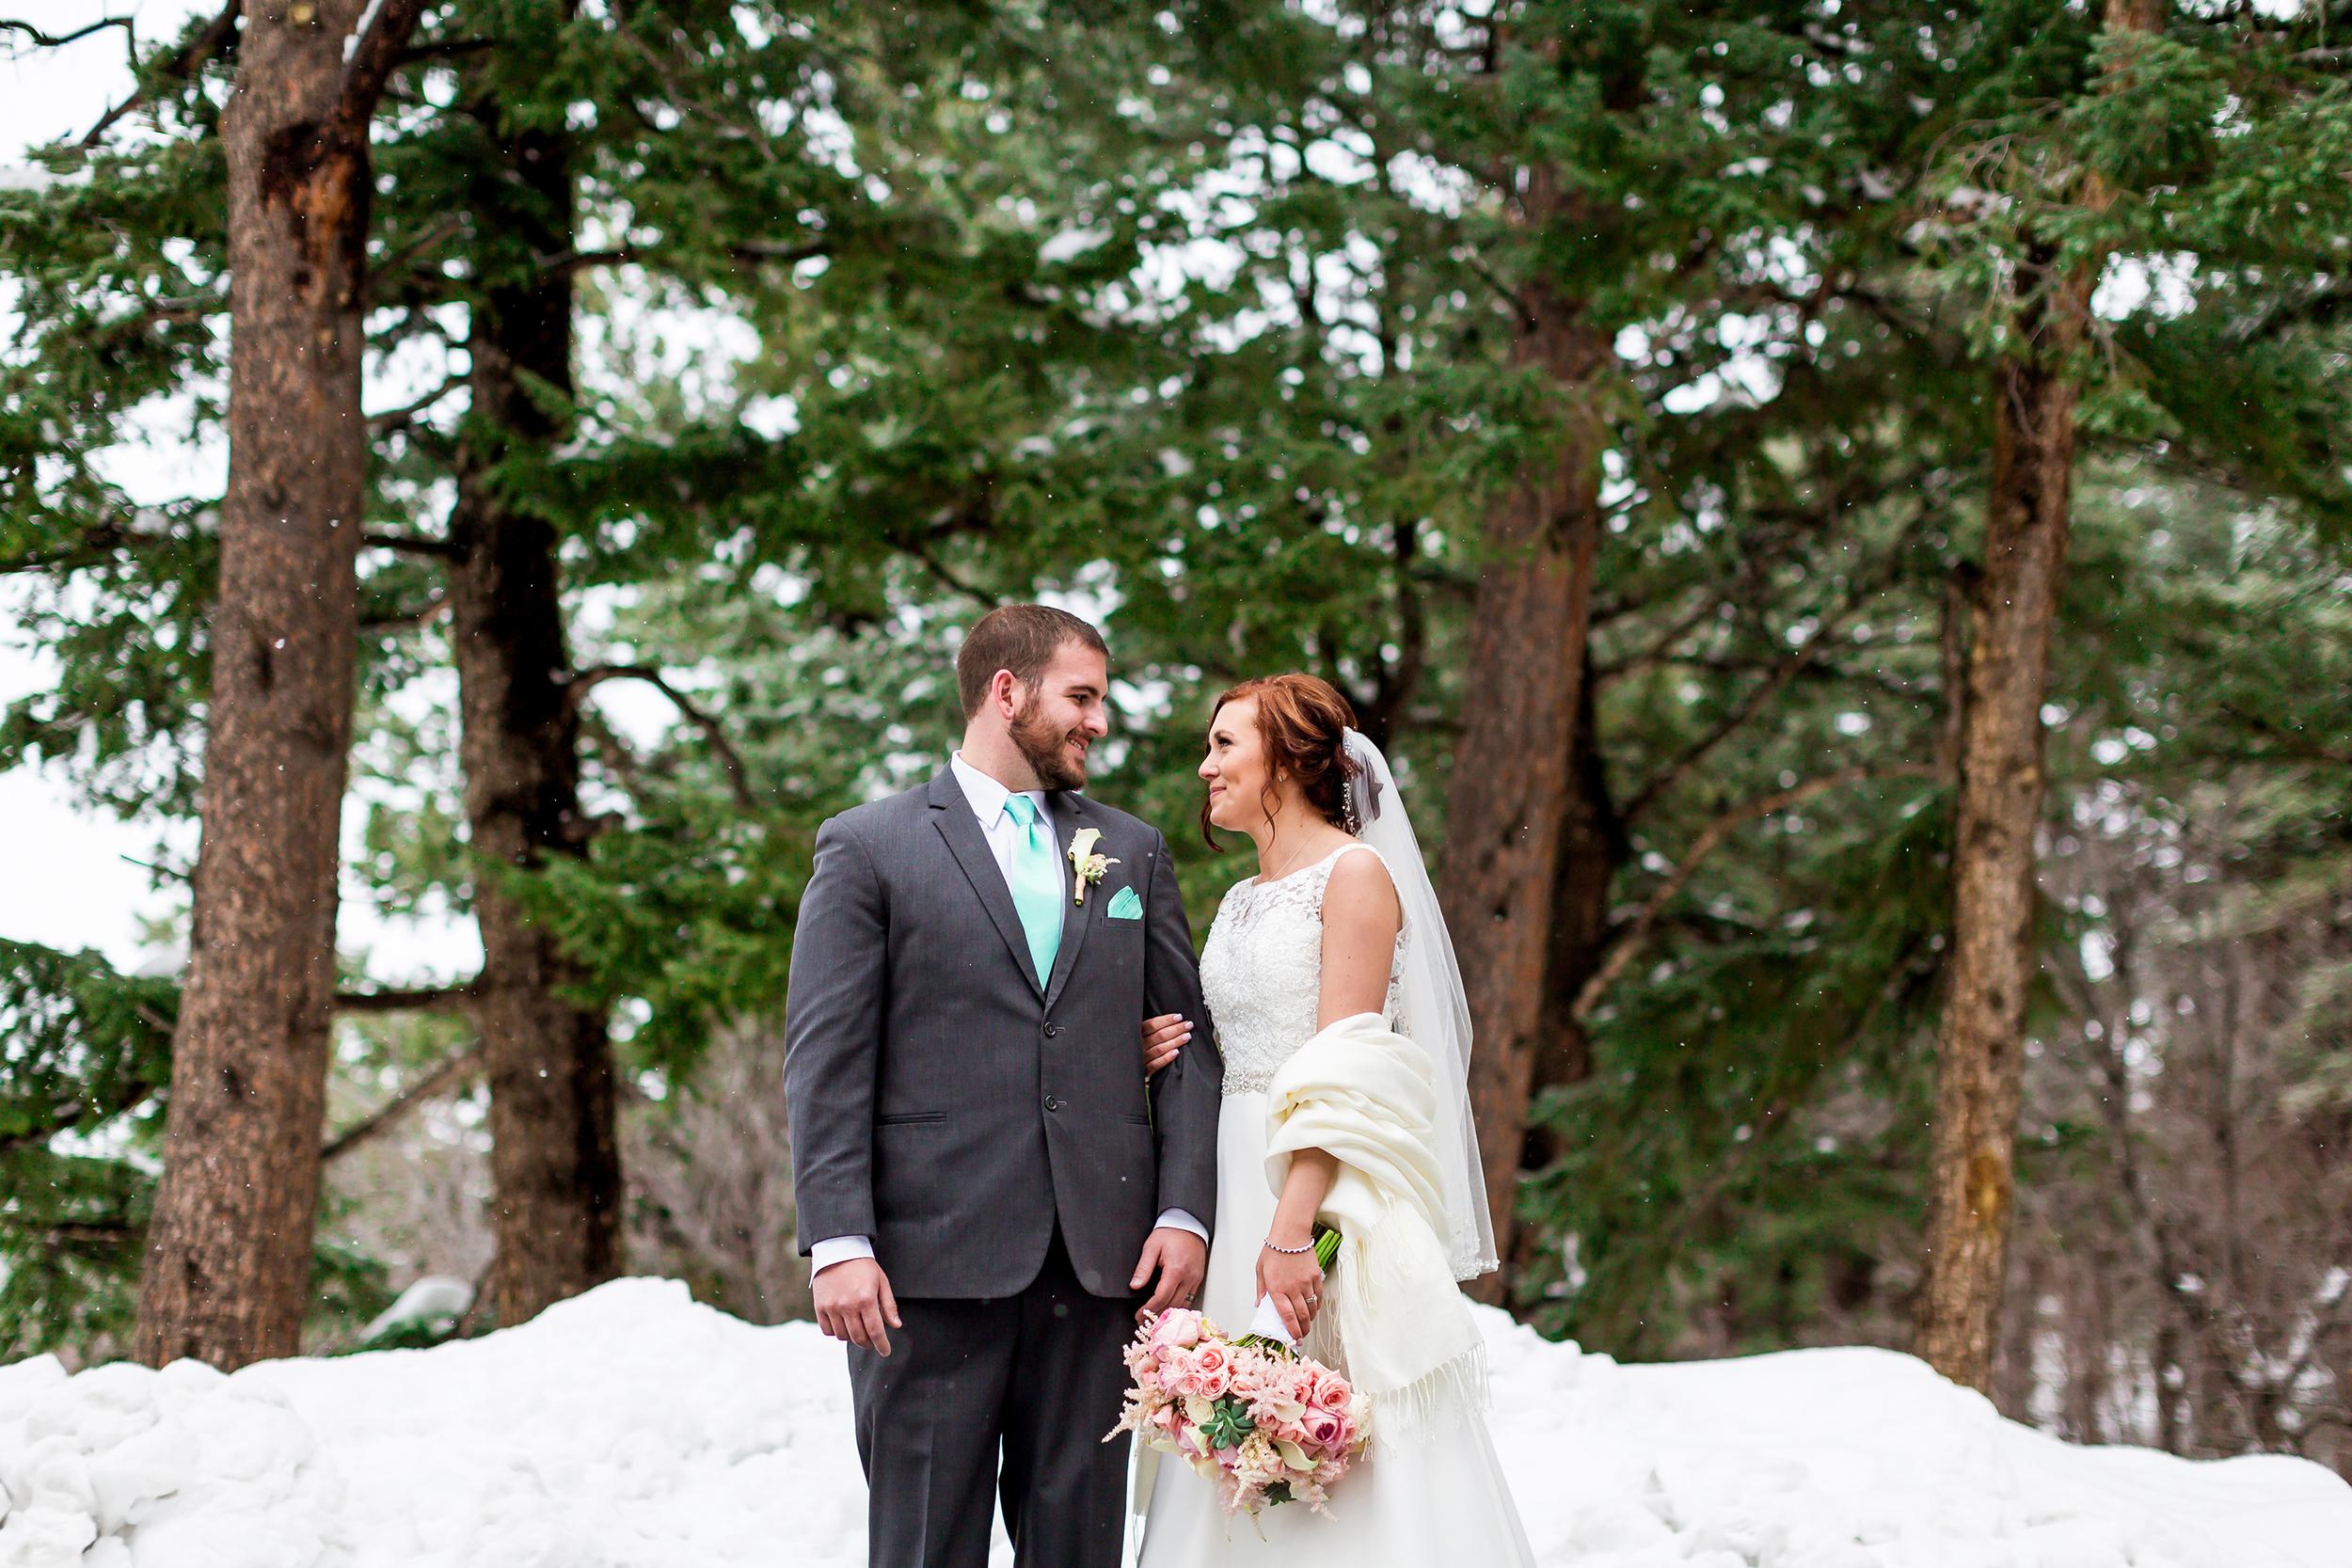 Colorado Mountain Photography By: Ashley McKenzie